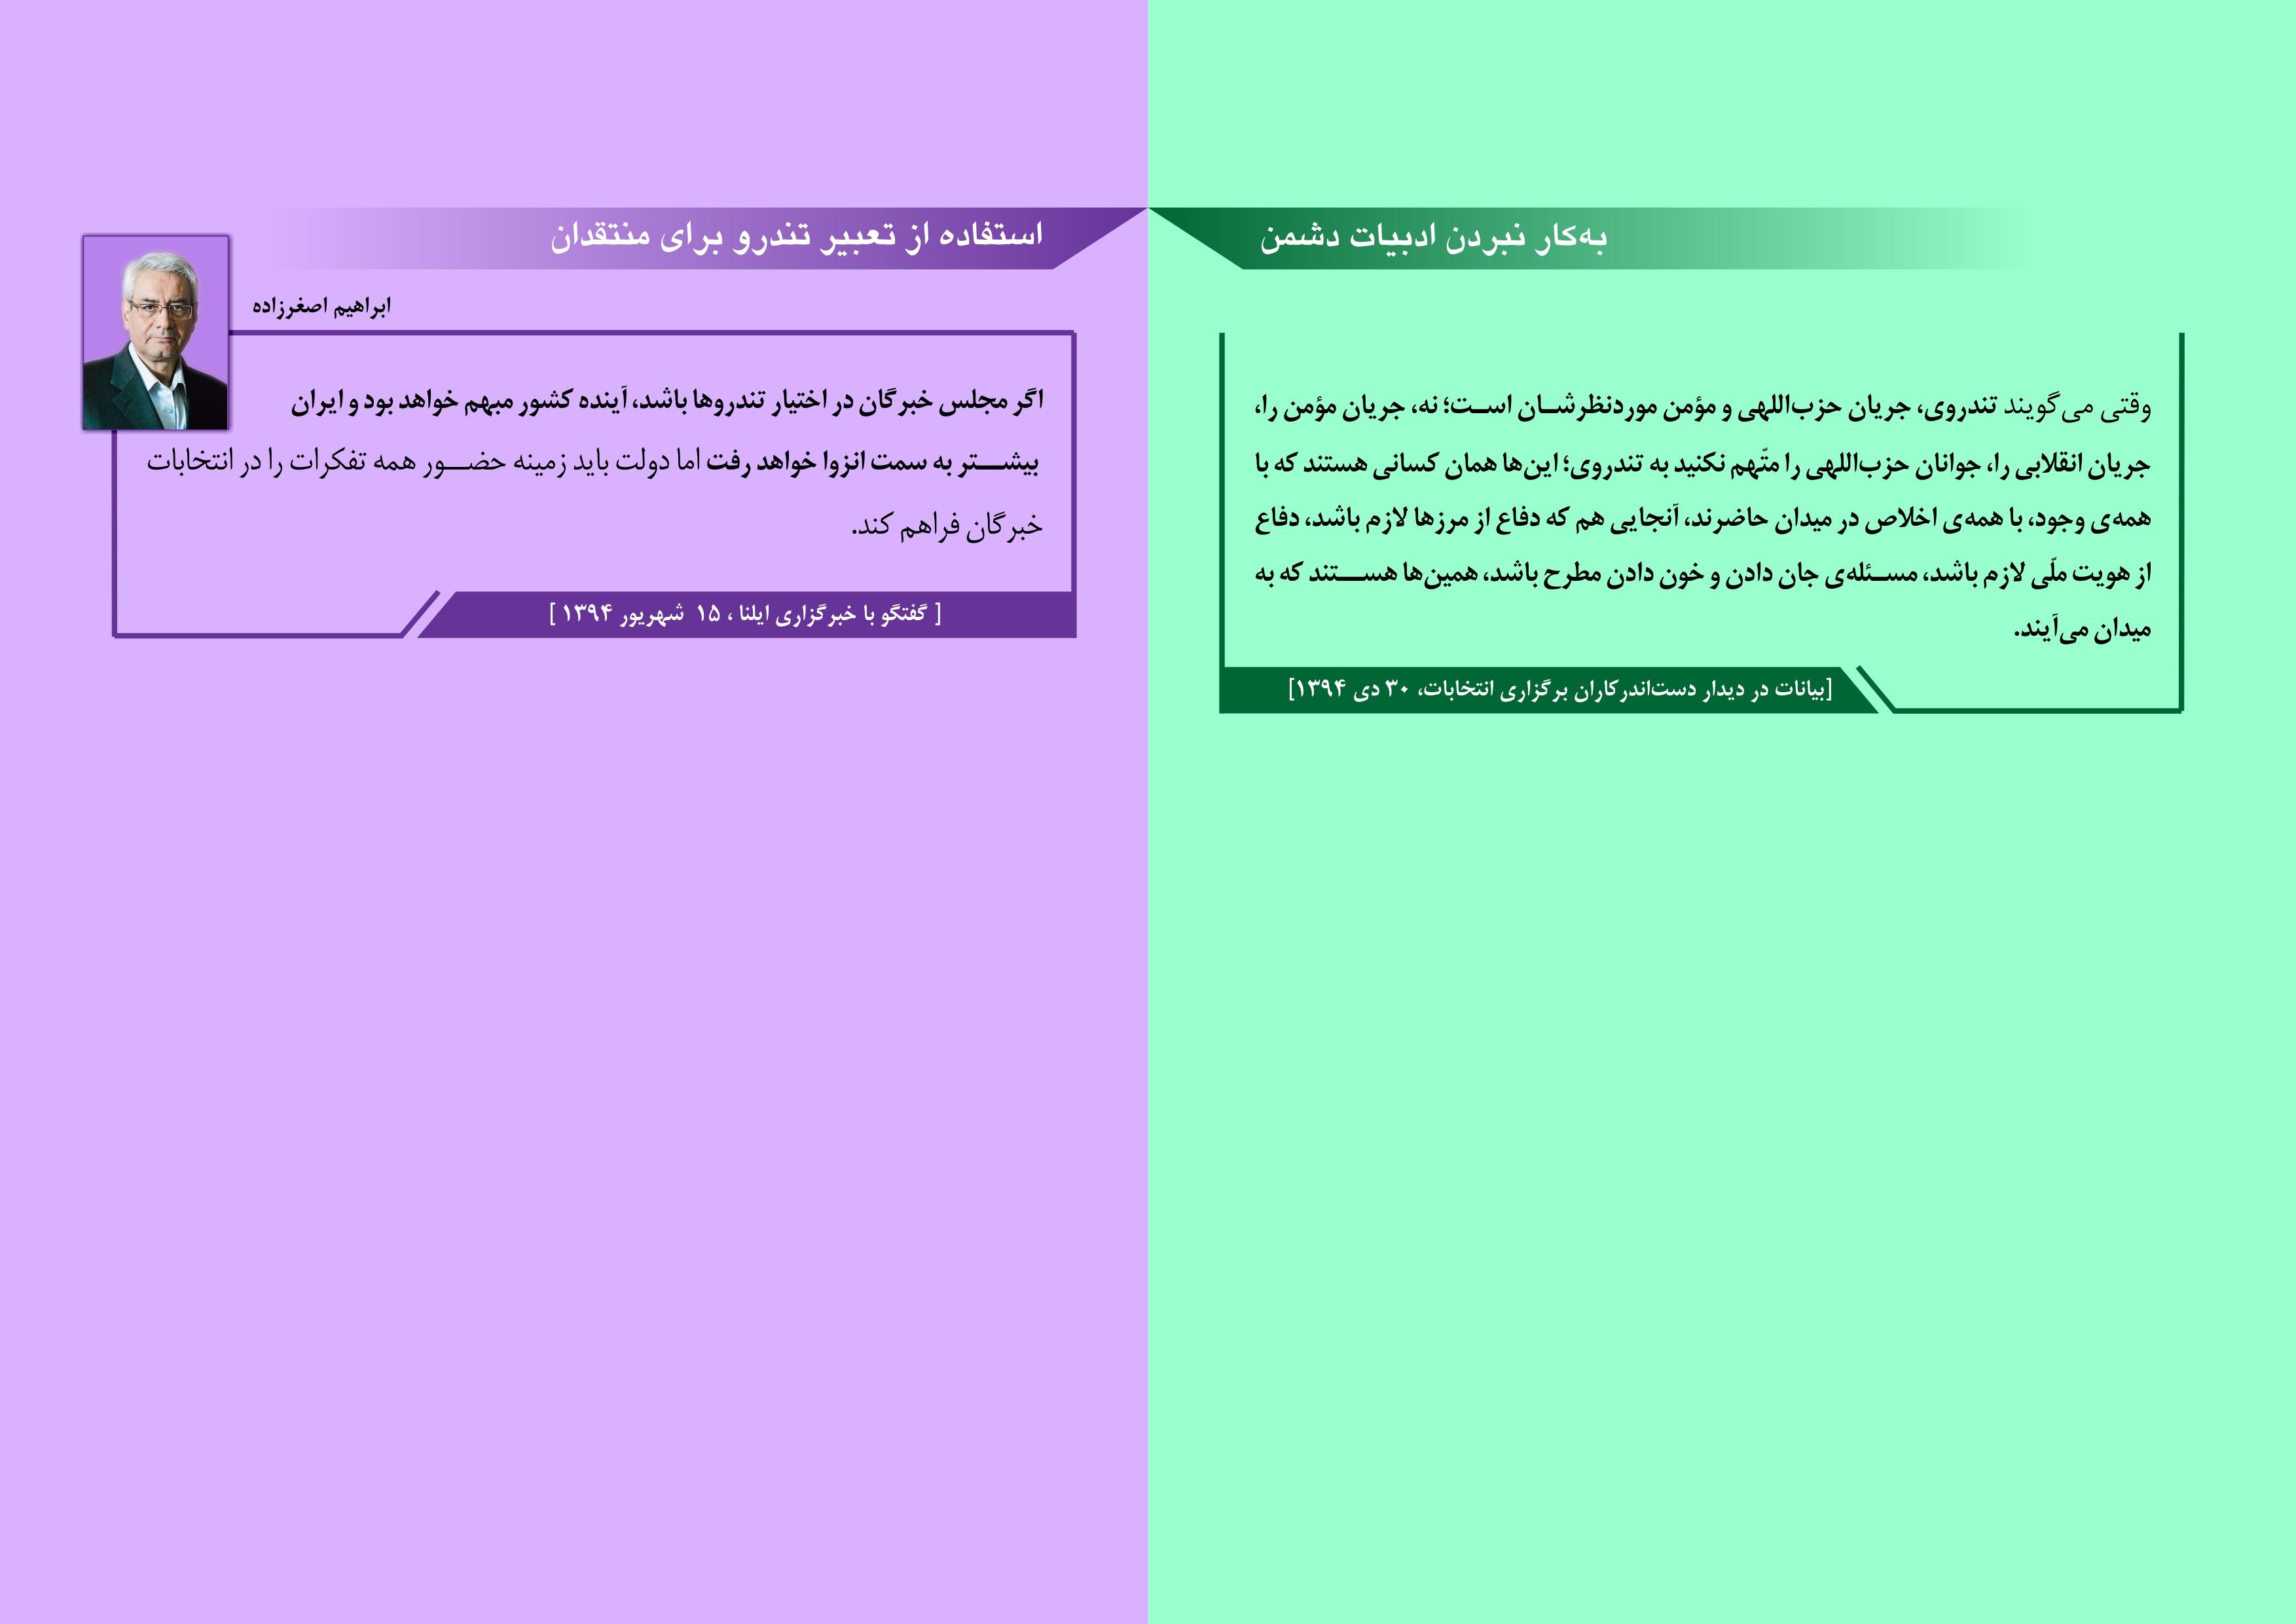 http://dl-abbasi.ir/yekta/1396/Image/Graphics/Taghabol/003-Political-18.jpg